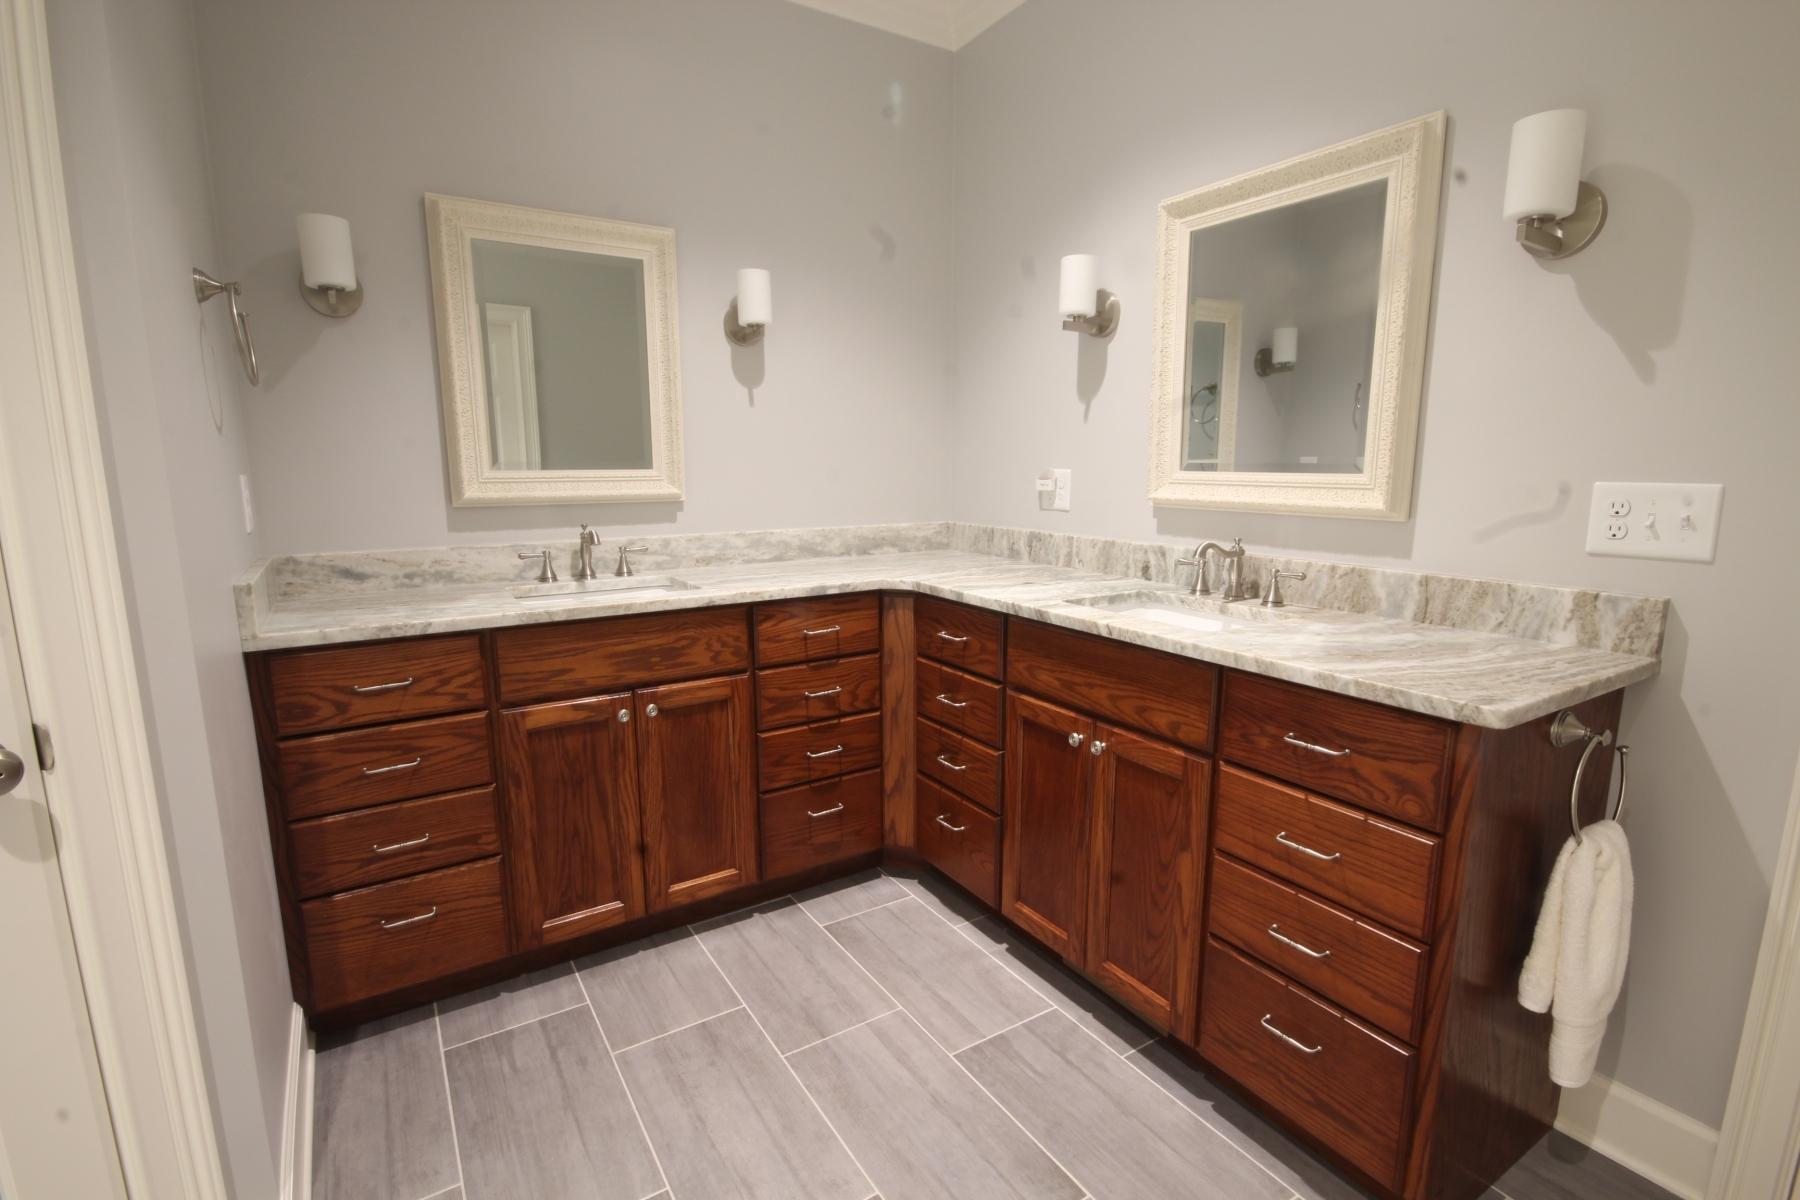 10-bh-bathroom-remodel-6